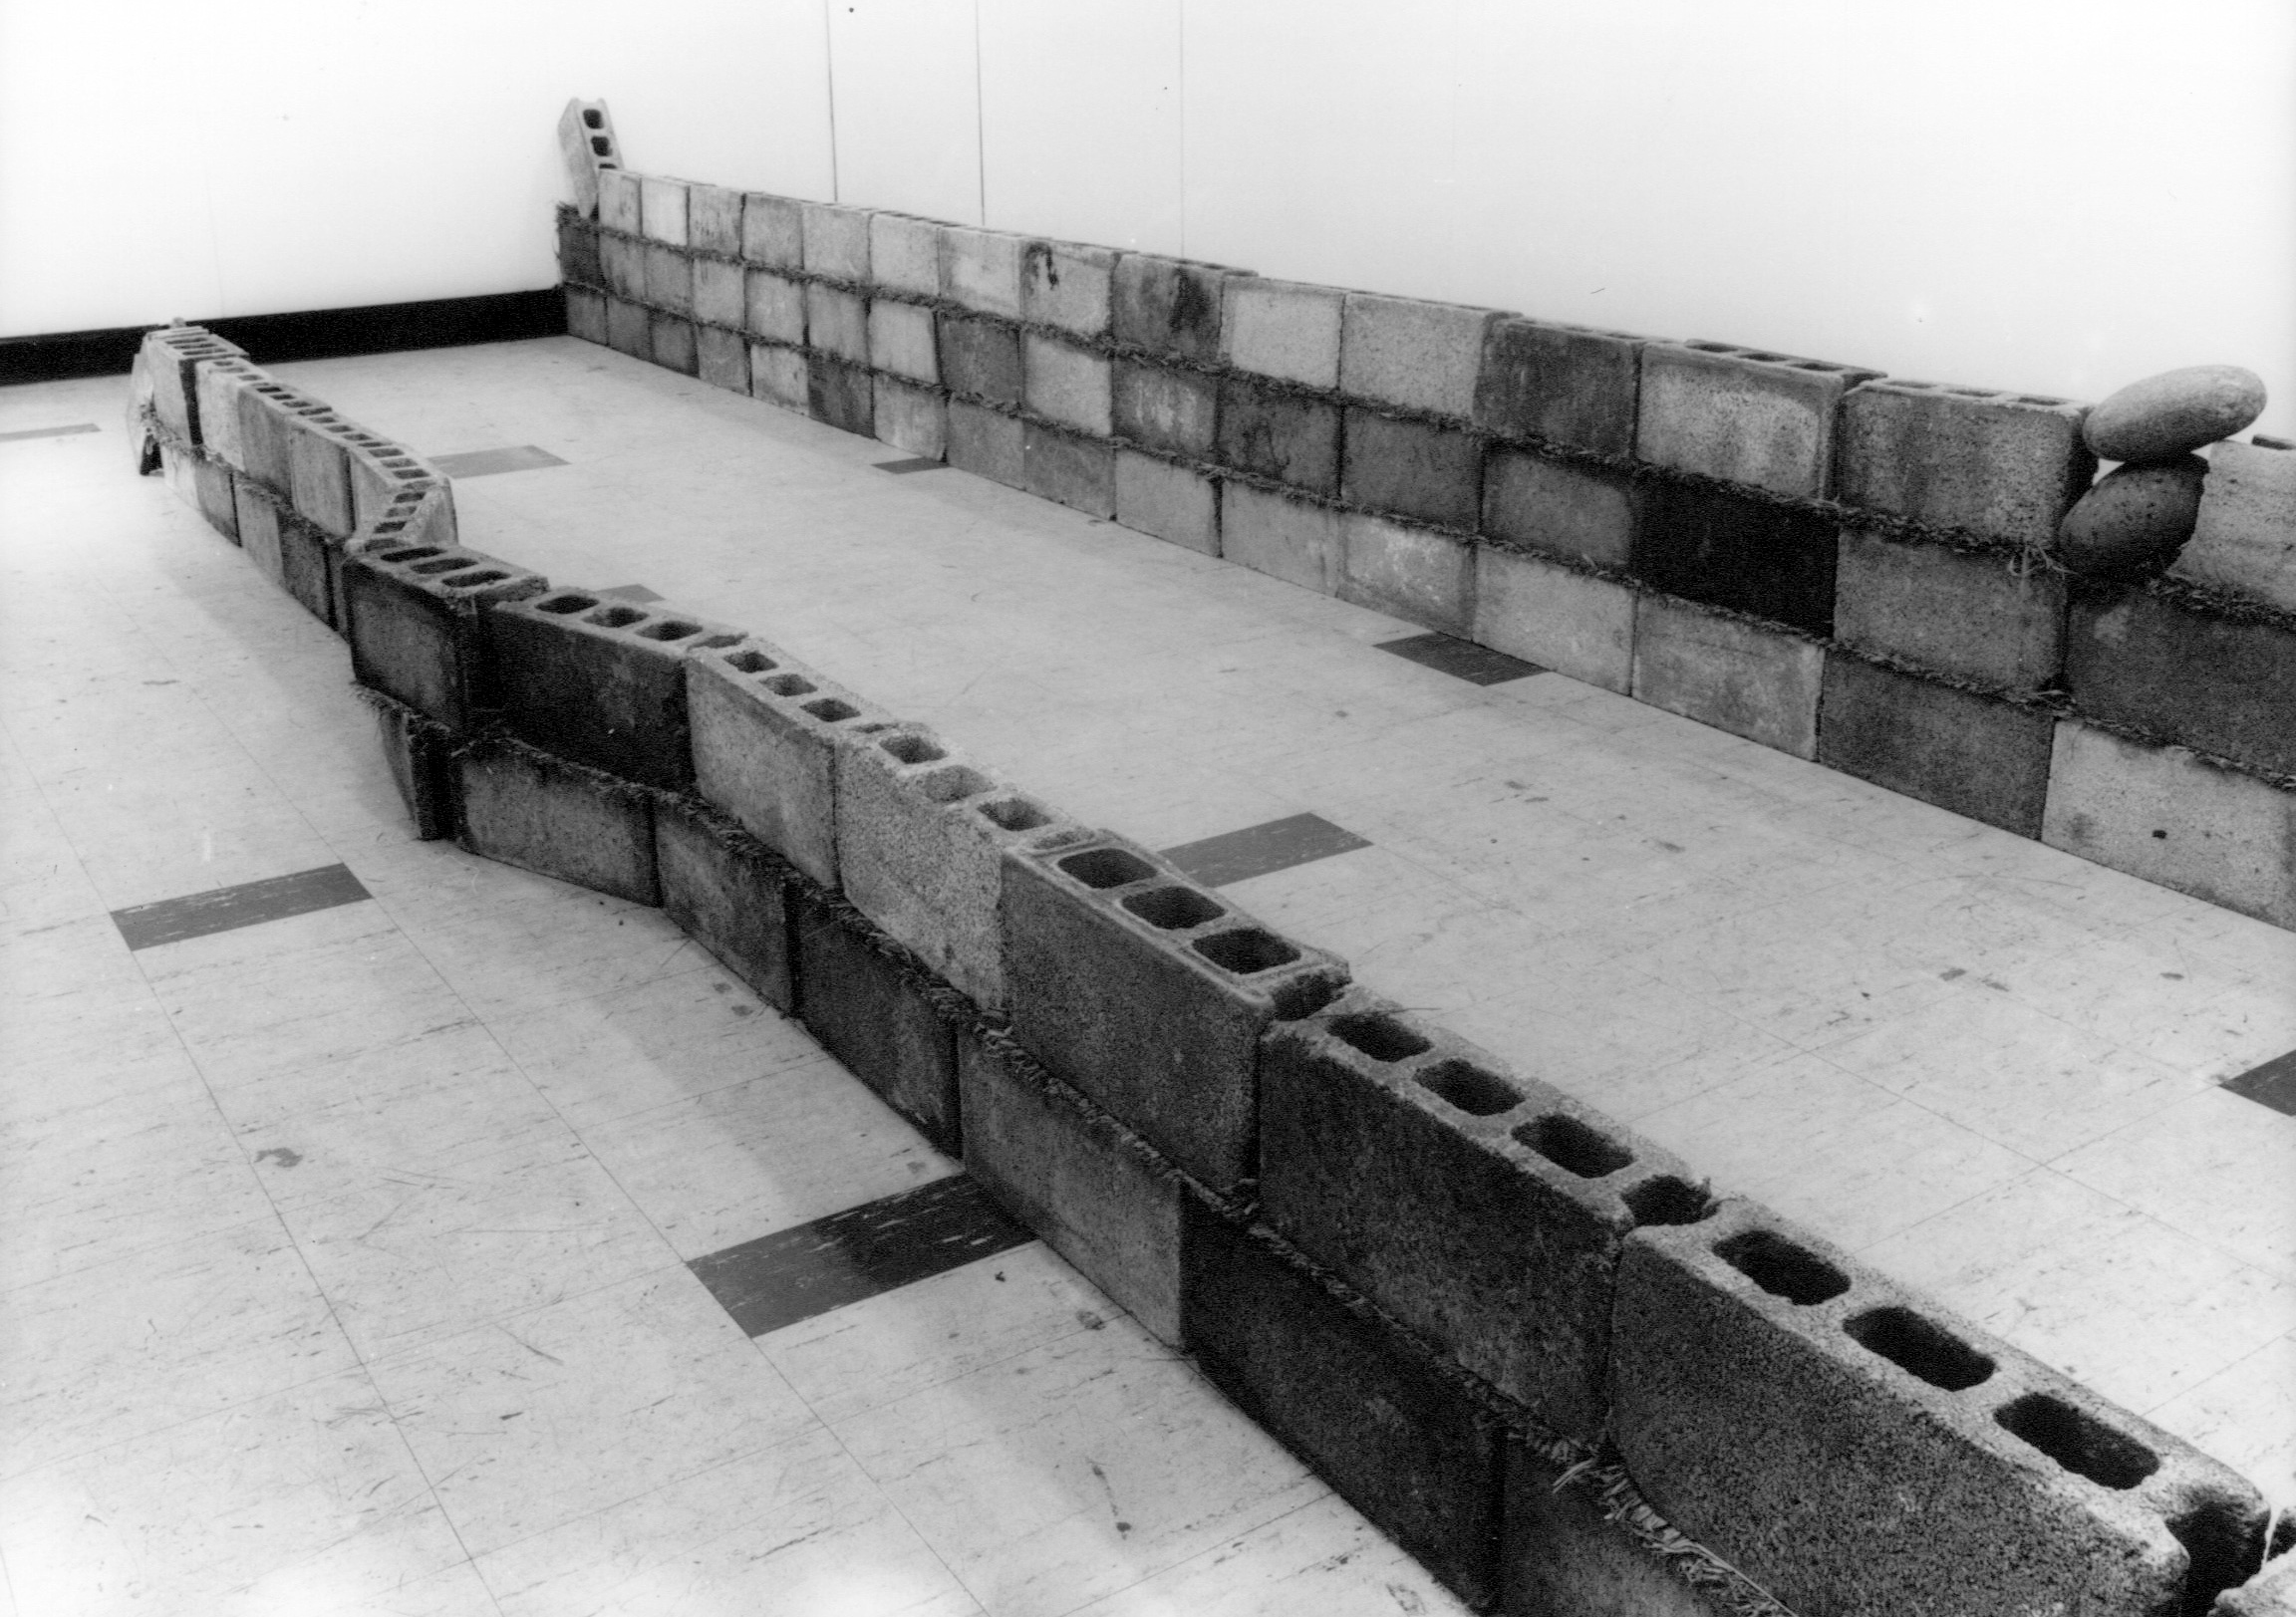 Units of Dependency ,1974 依存位 ( Izon'i ) Concrete blocks, grass Dimensions variable Installation view,Tamura Gallery, Tokyo, 1974 Photo: Kishio Suga